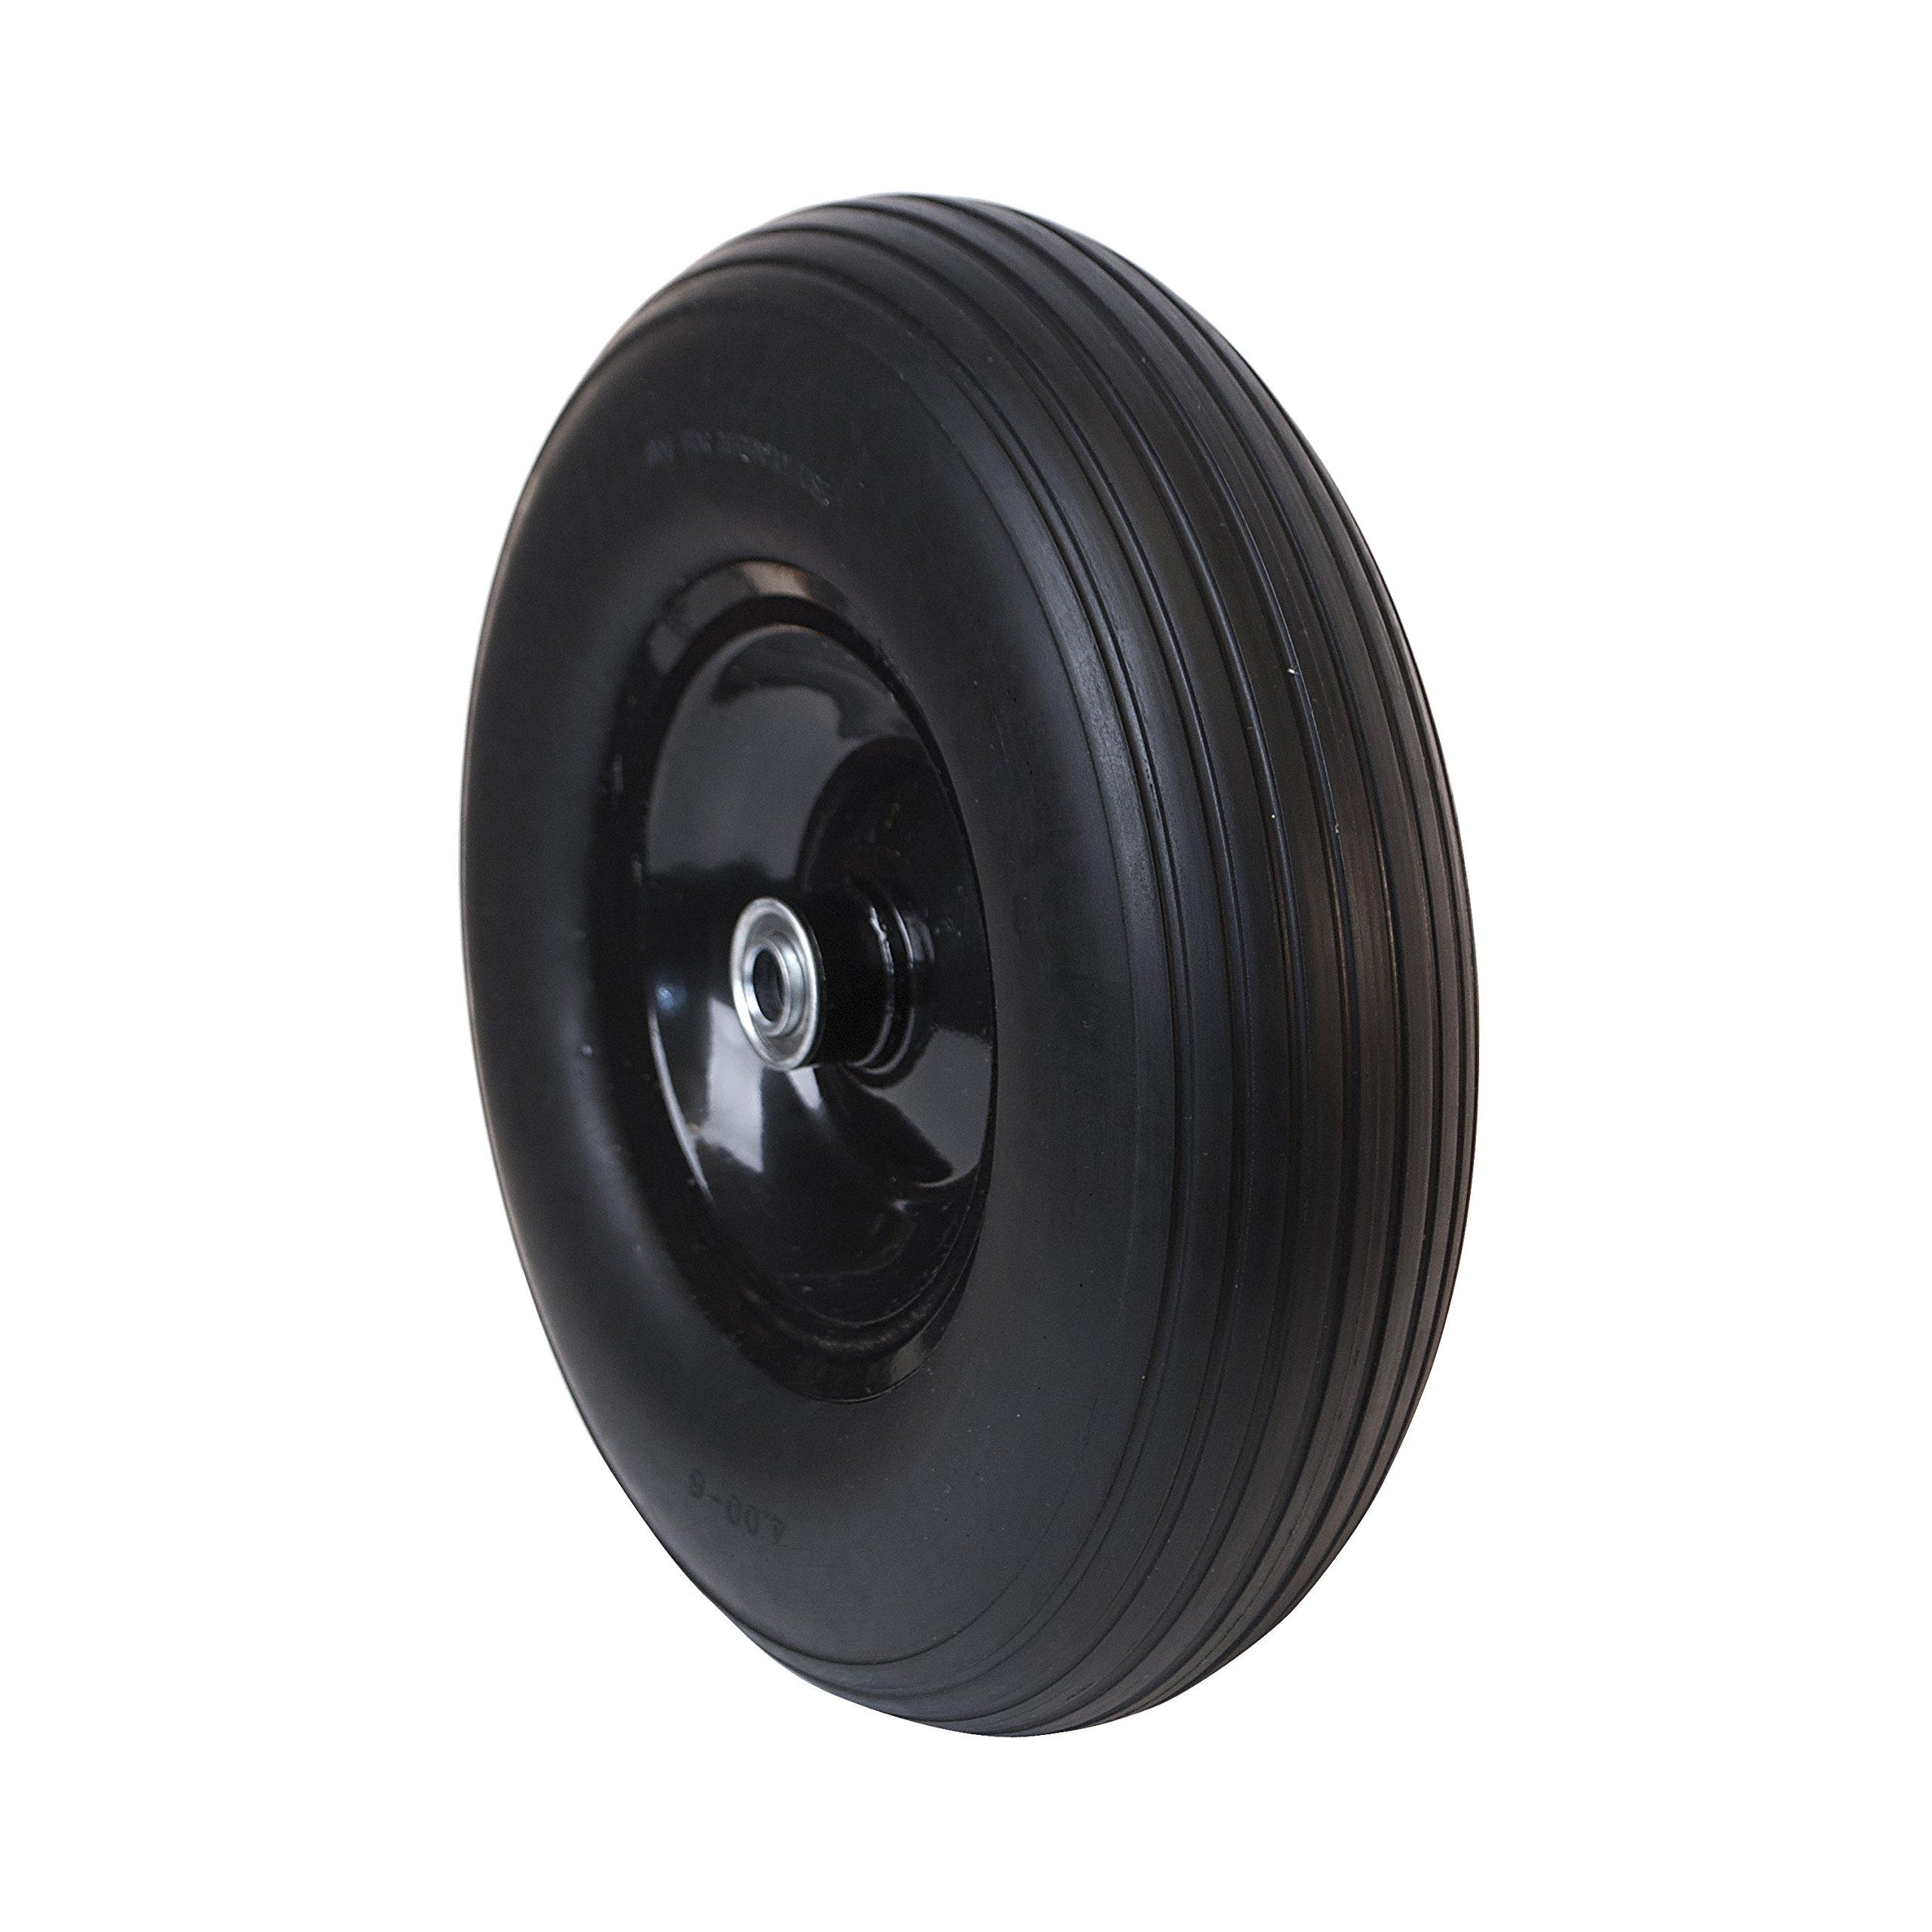 ALEKO WBNF13 Anti Flat Ribbed Replacement Wheel for Wheelbarrow 13 Inches No Flat Tire Black